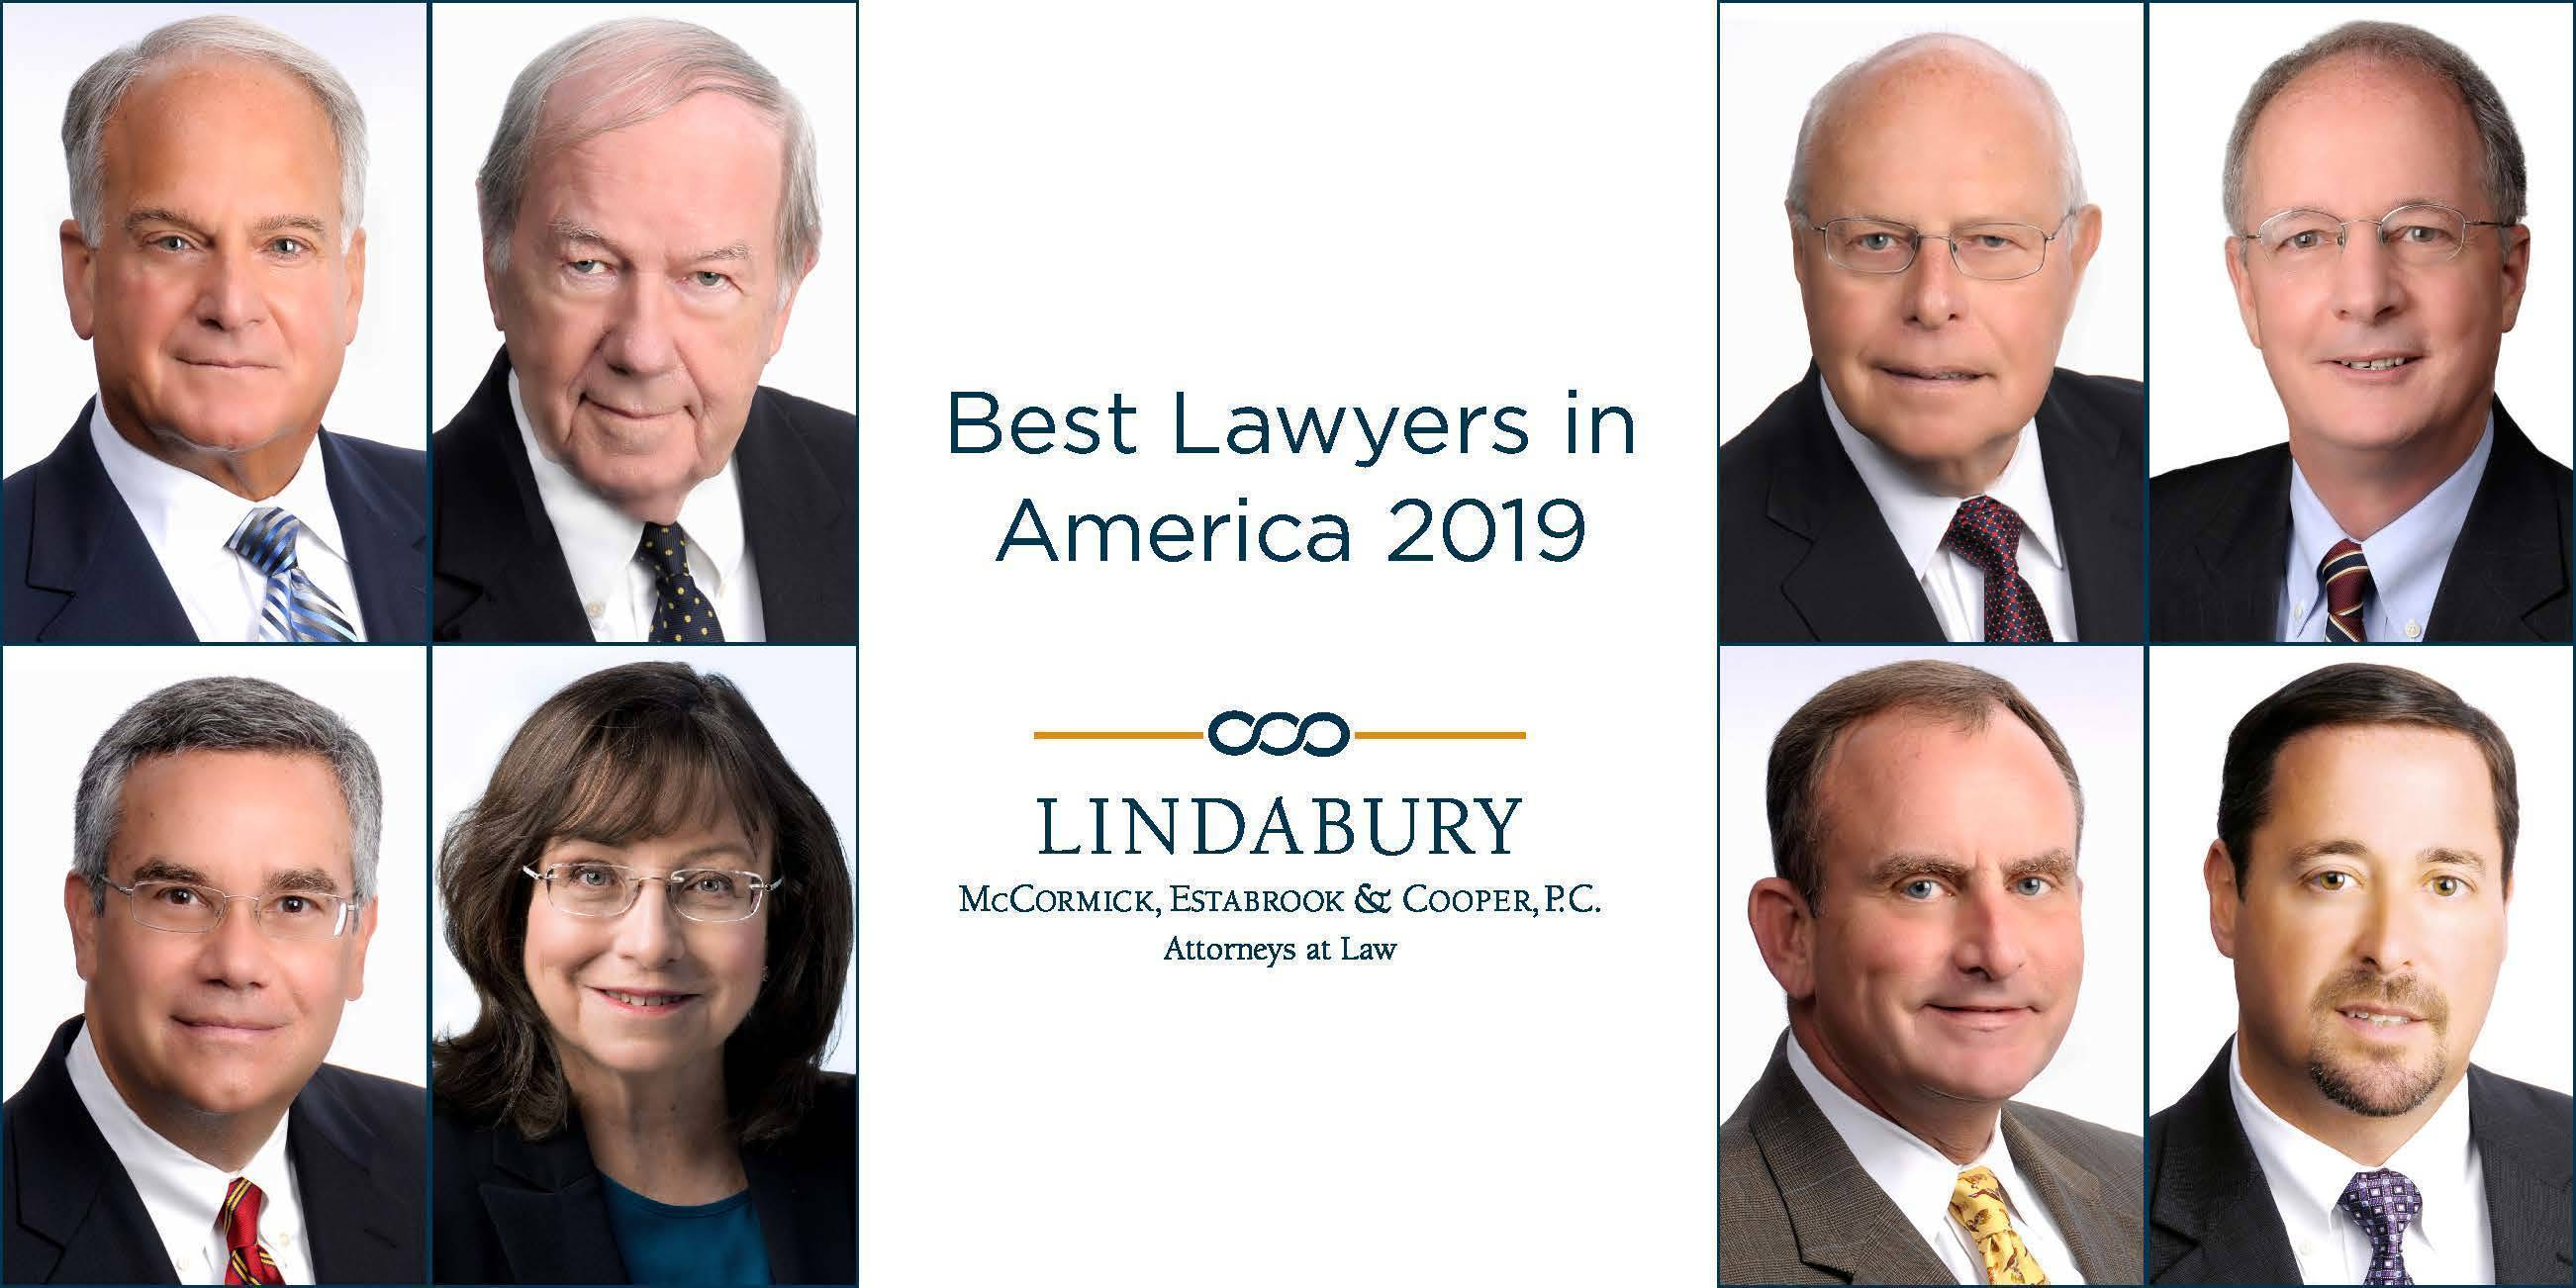 8 Lindabury, McCormick, Estabrook & Cooper, P.C. Attorneys Named to 2019 Best Lawyers List